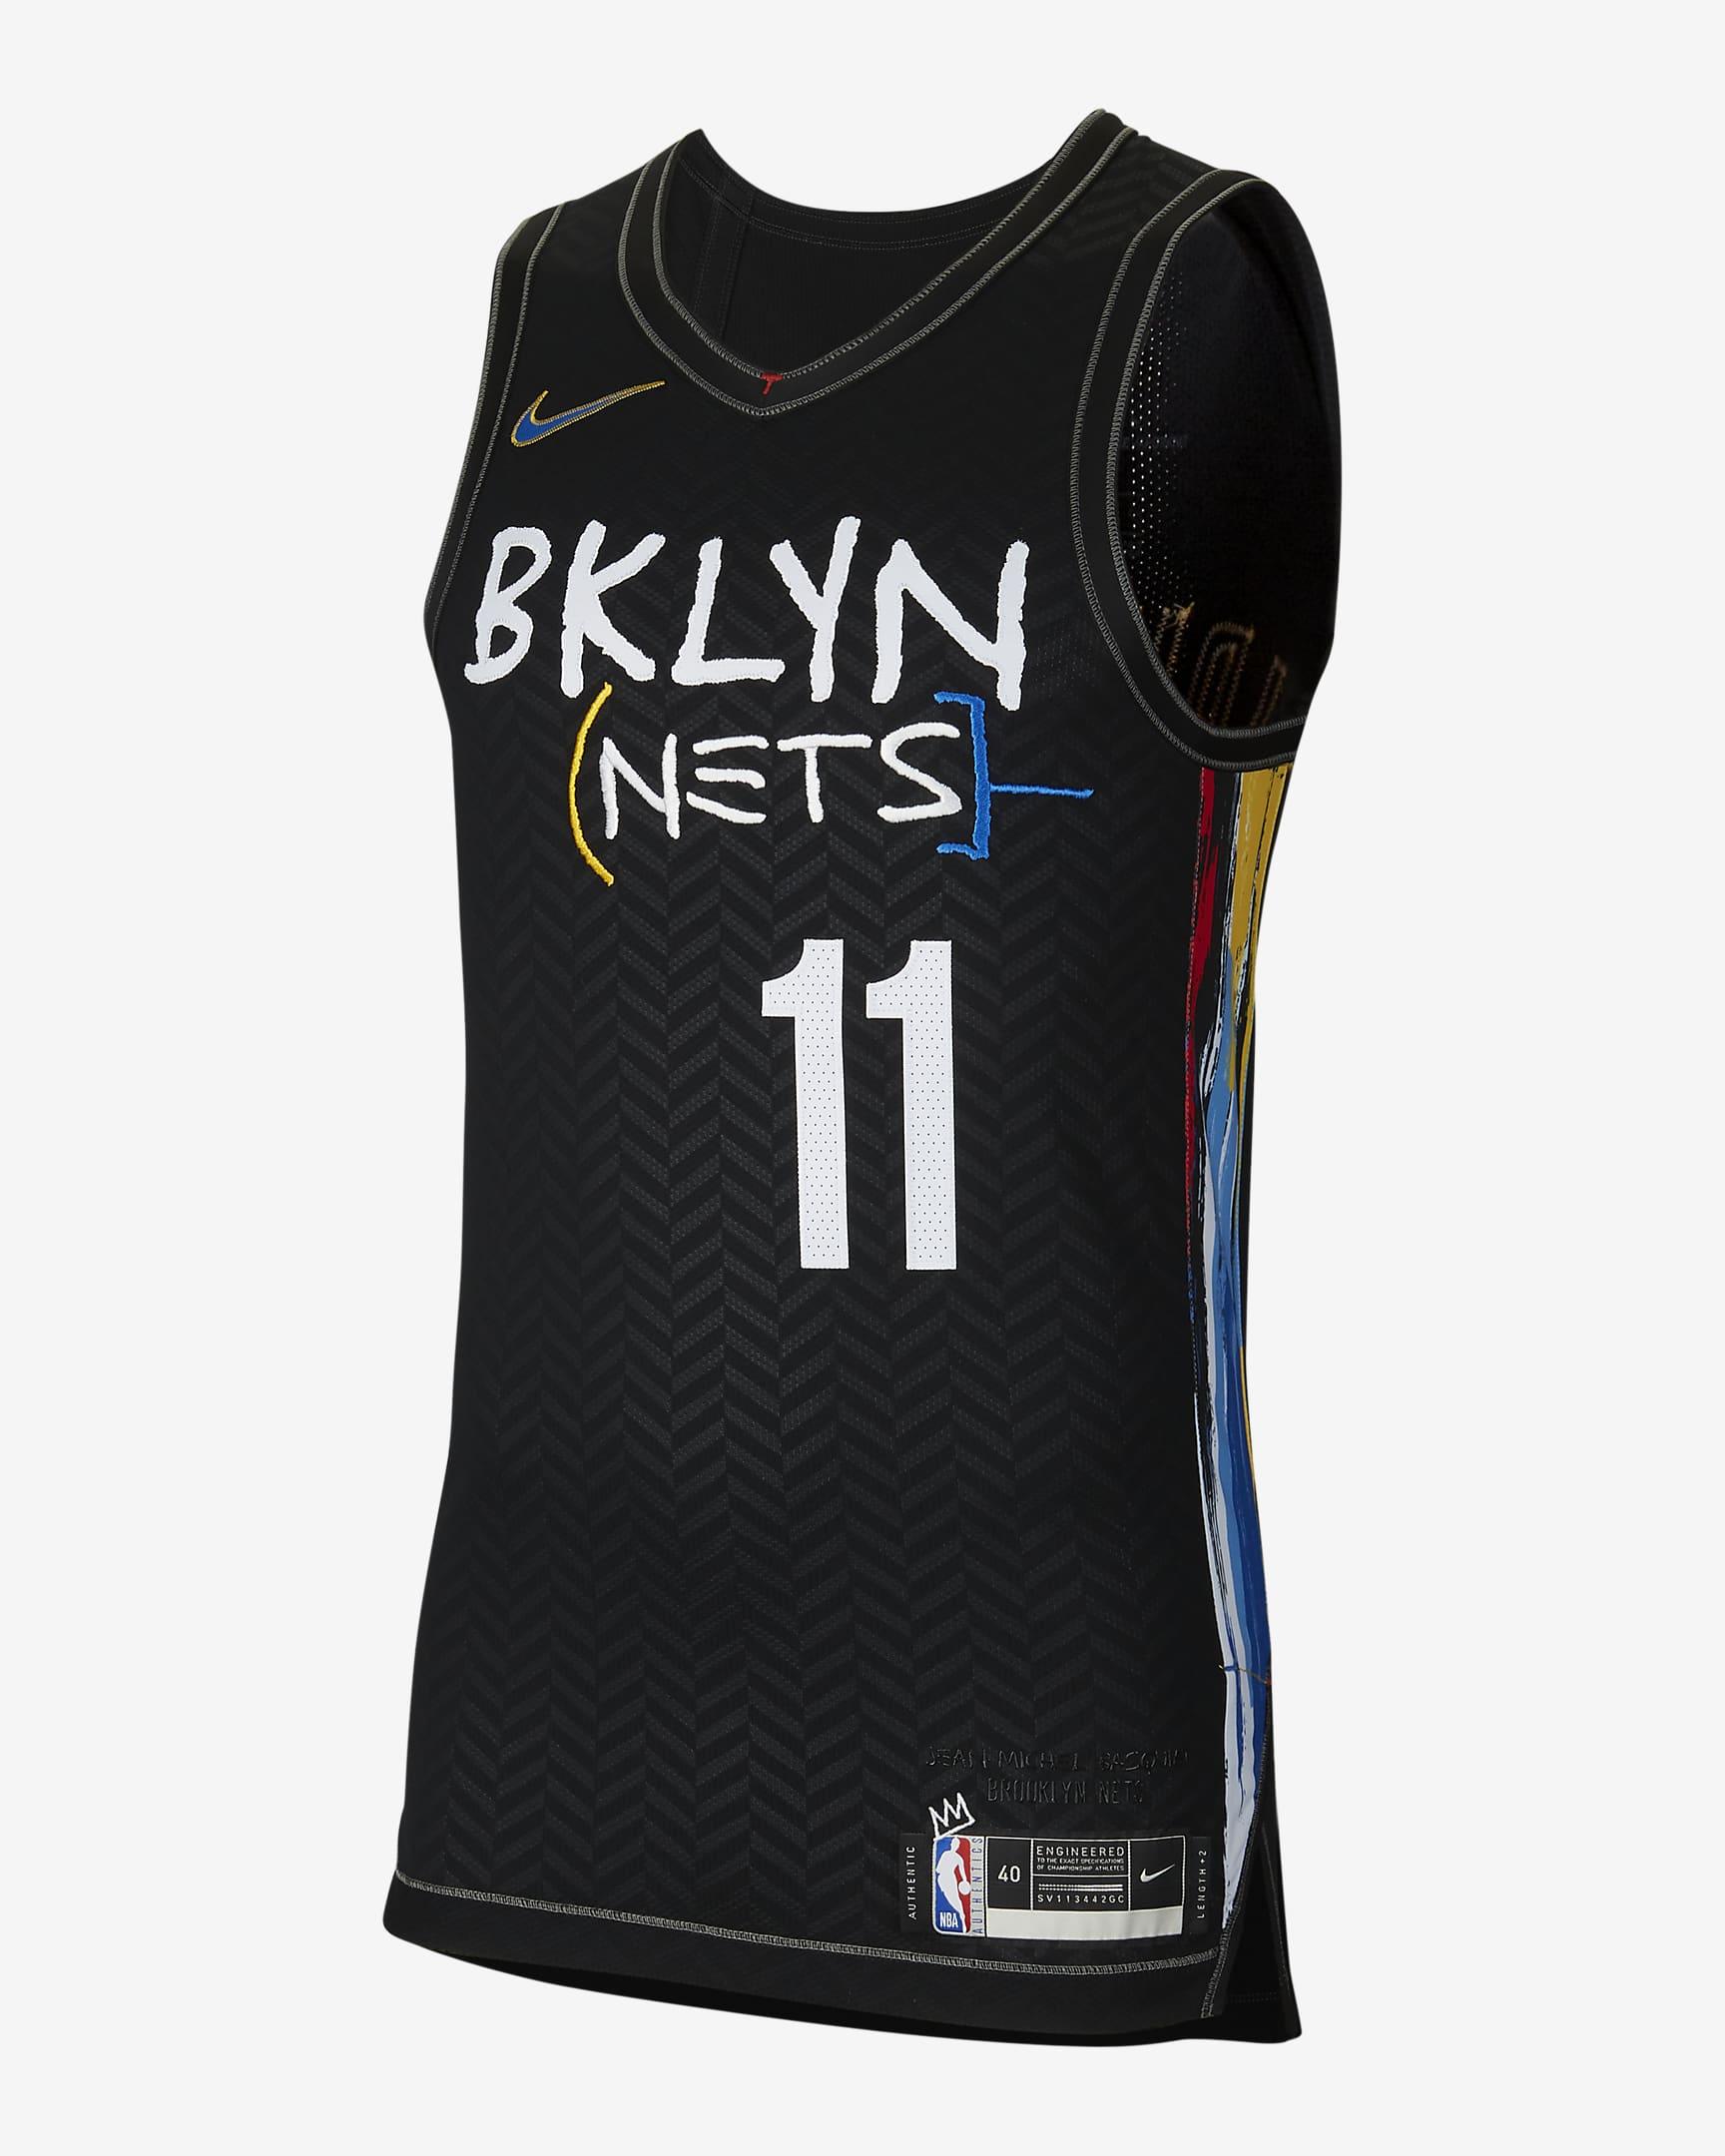 brooklyn-nets-city-edition-camiseta-authentic-nba-drJLHj